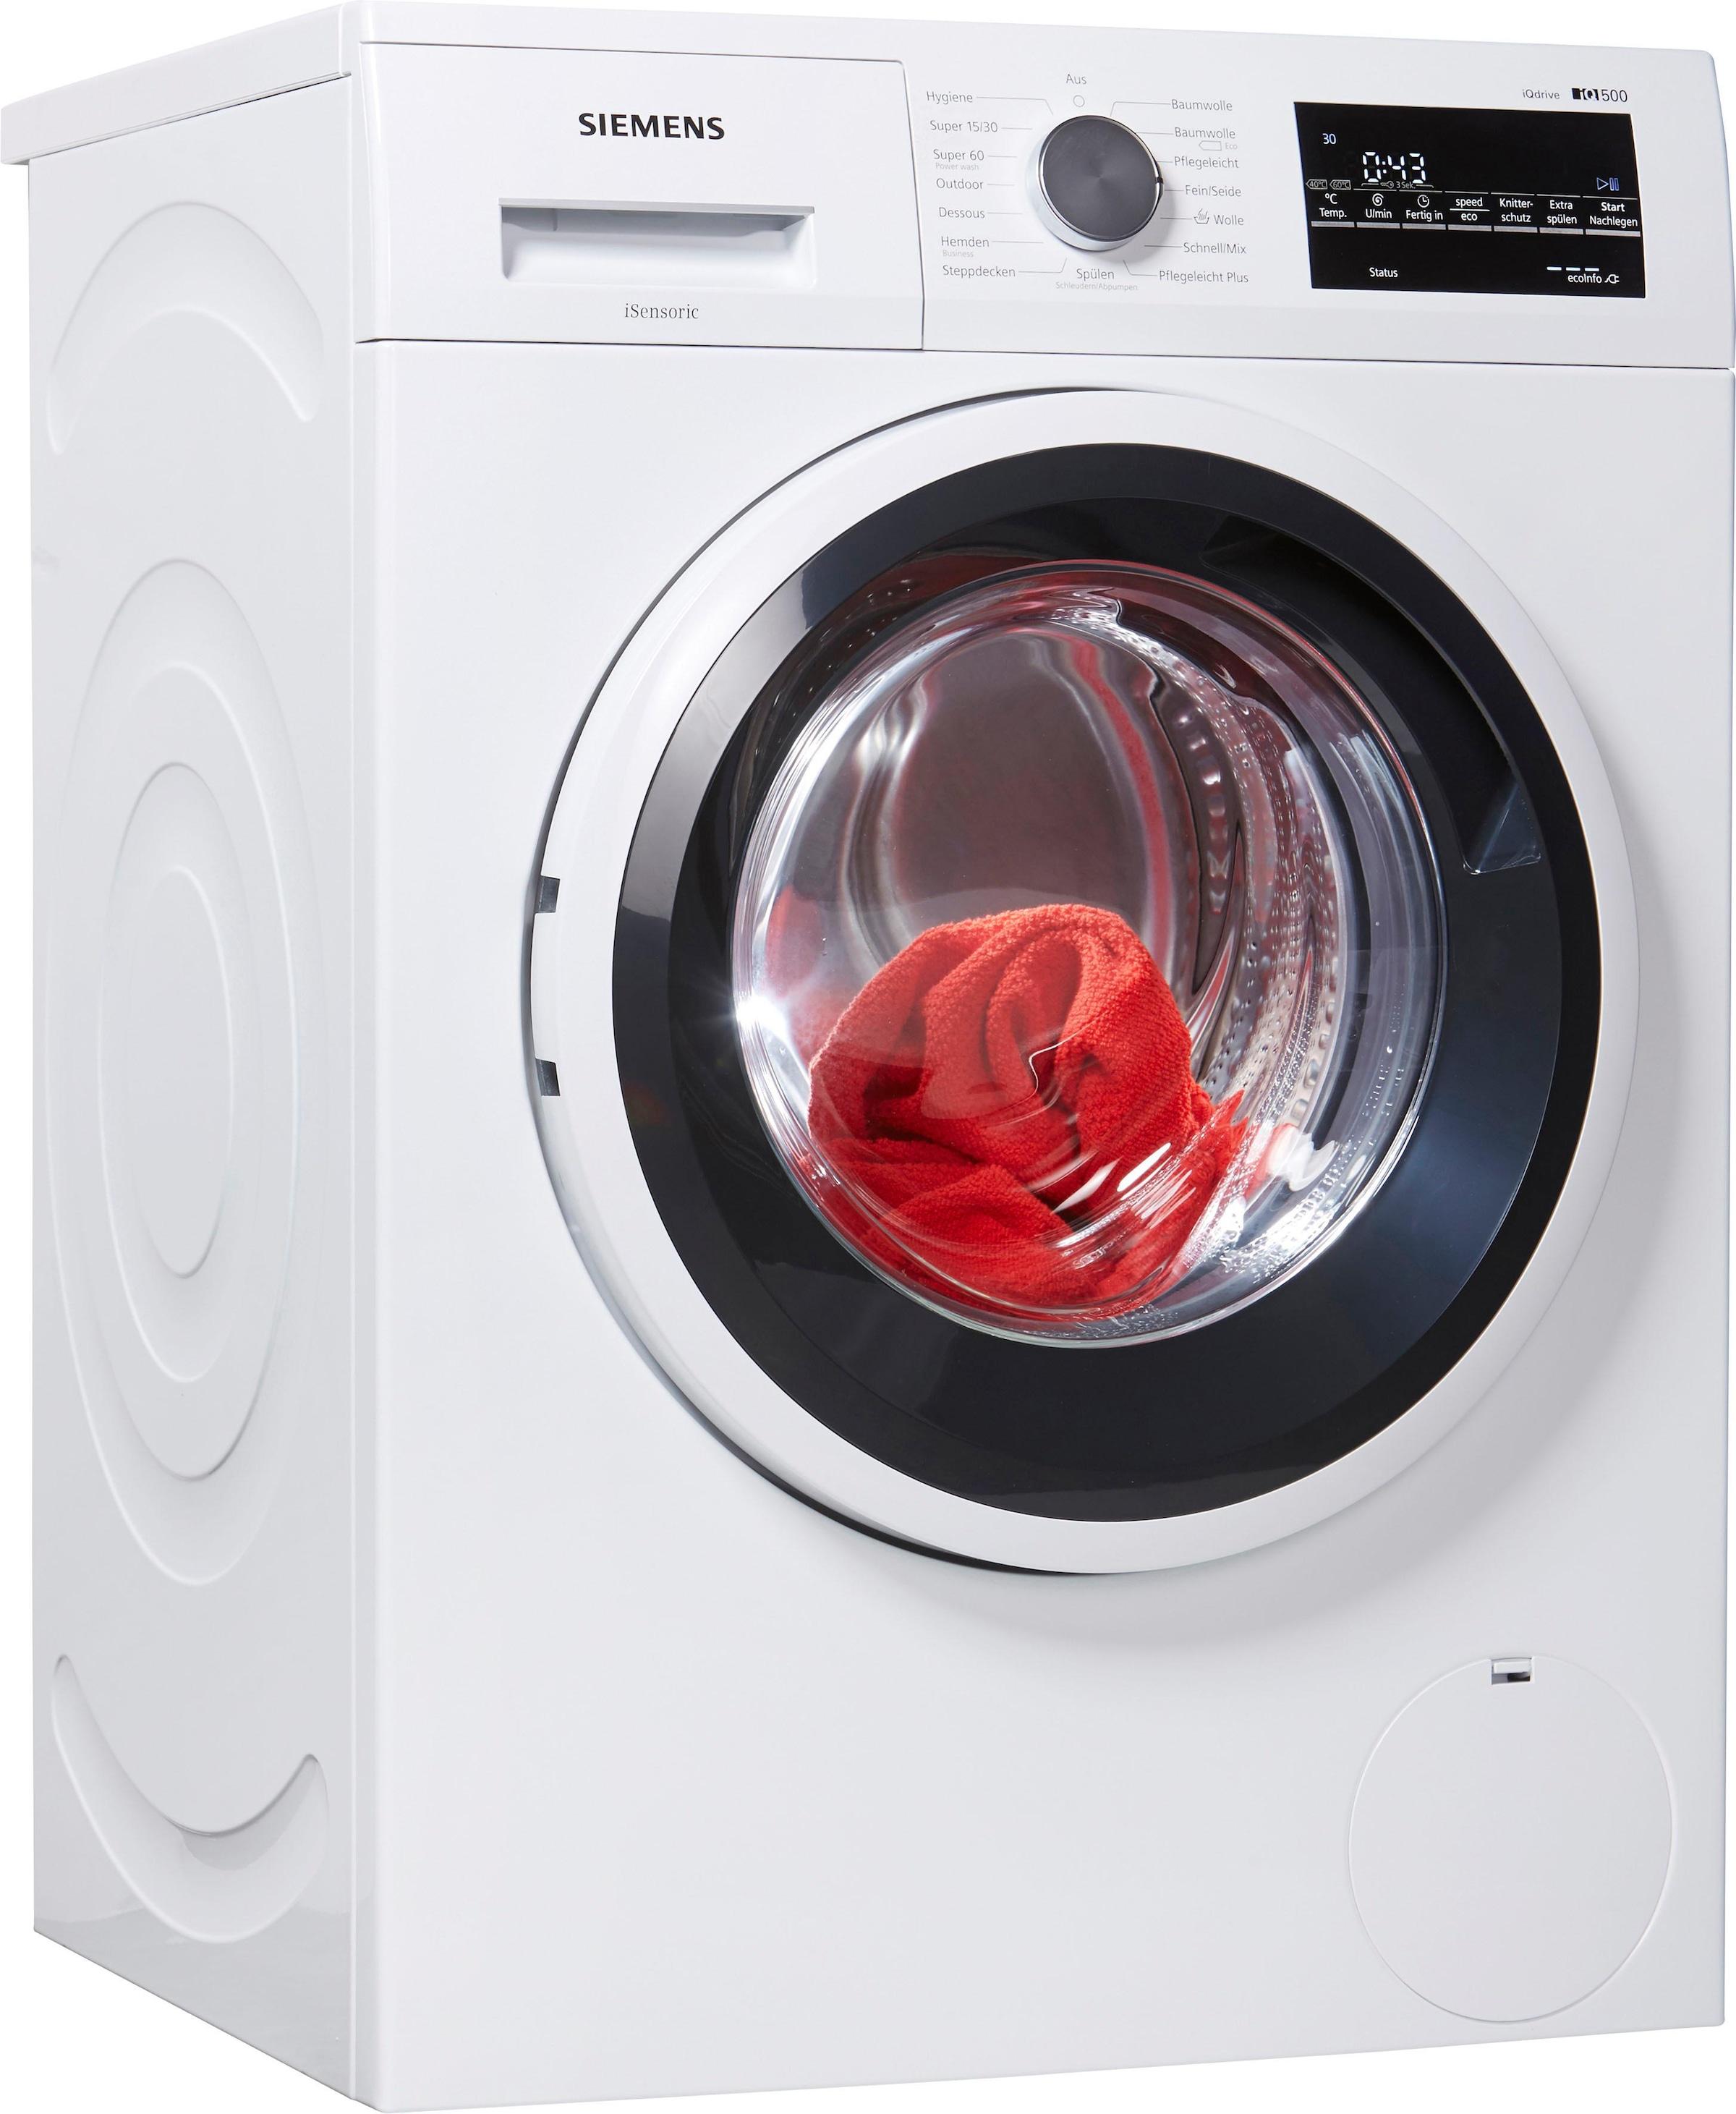 Siemens waschmaschinen onlineshop siemens waschmaschinen online